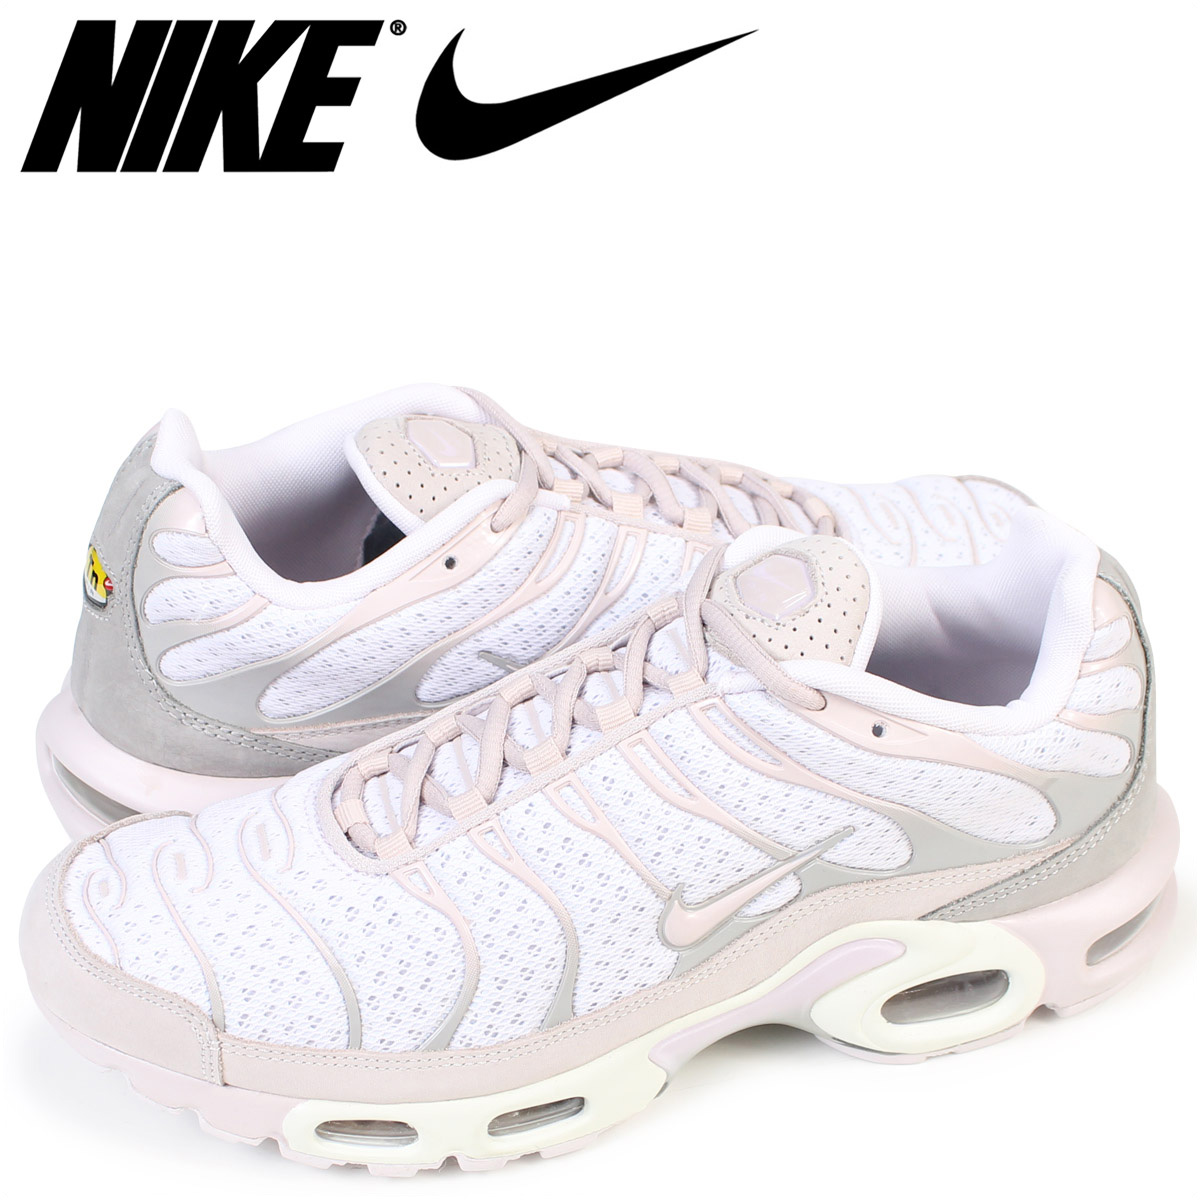 Nike Air Max Tn Chaussures Pour Hommes Blanc 11009 Granby